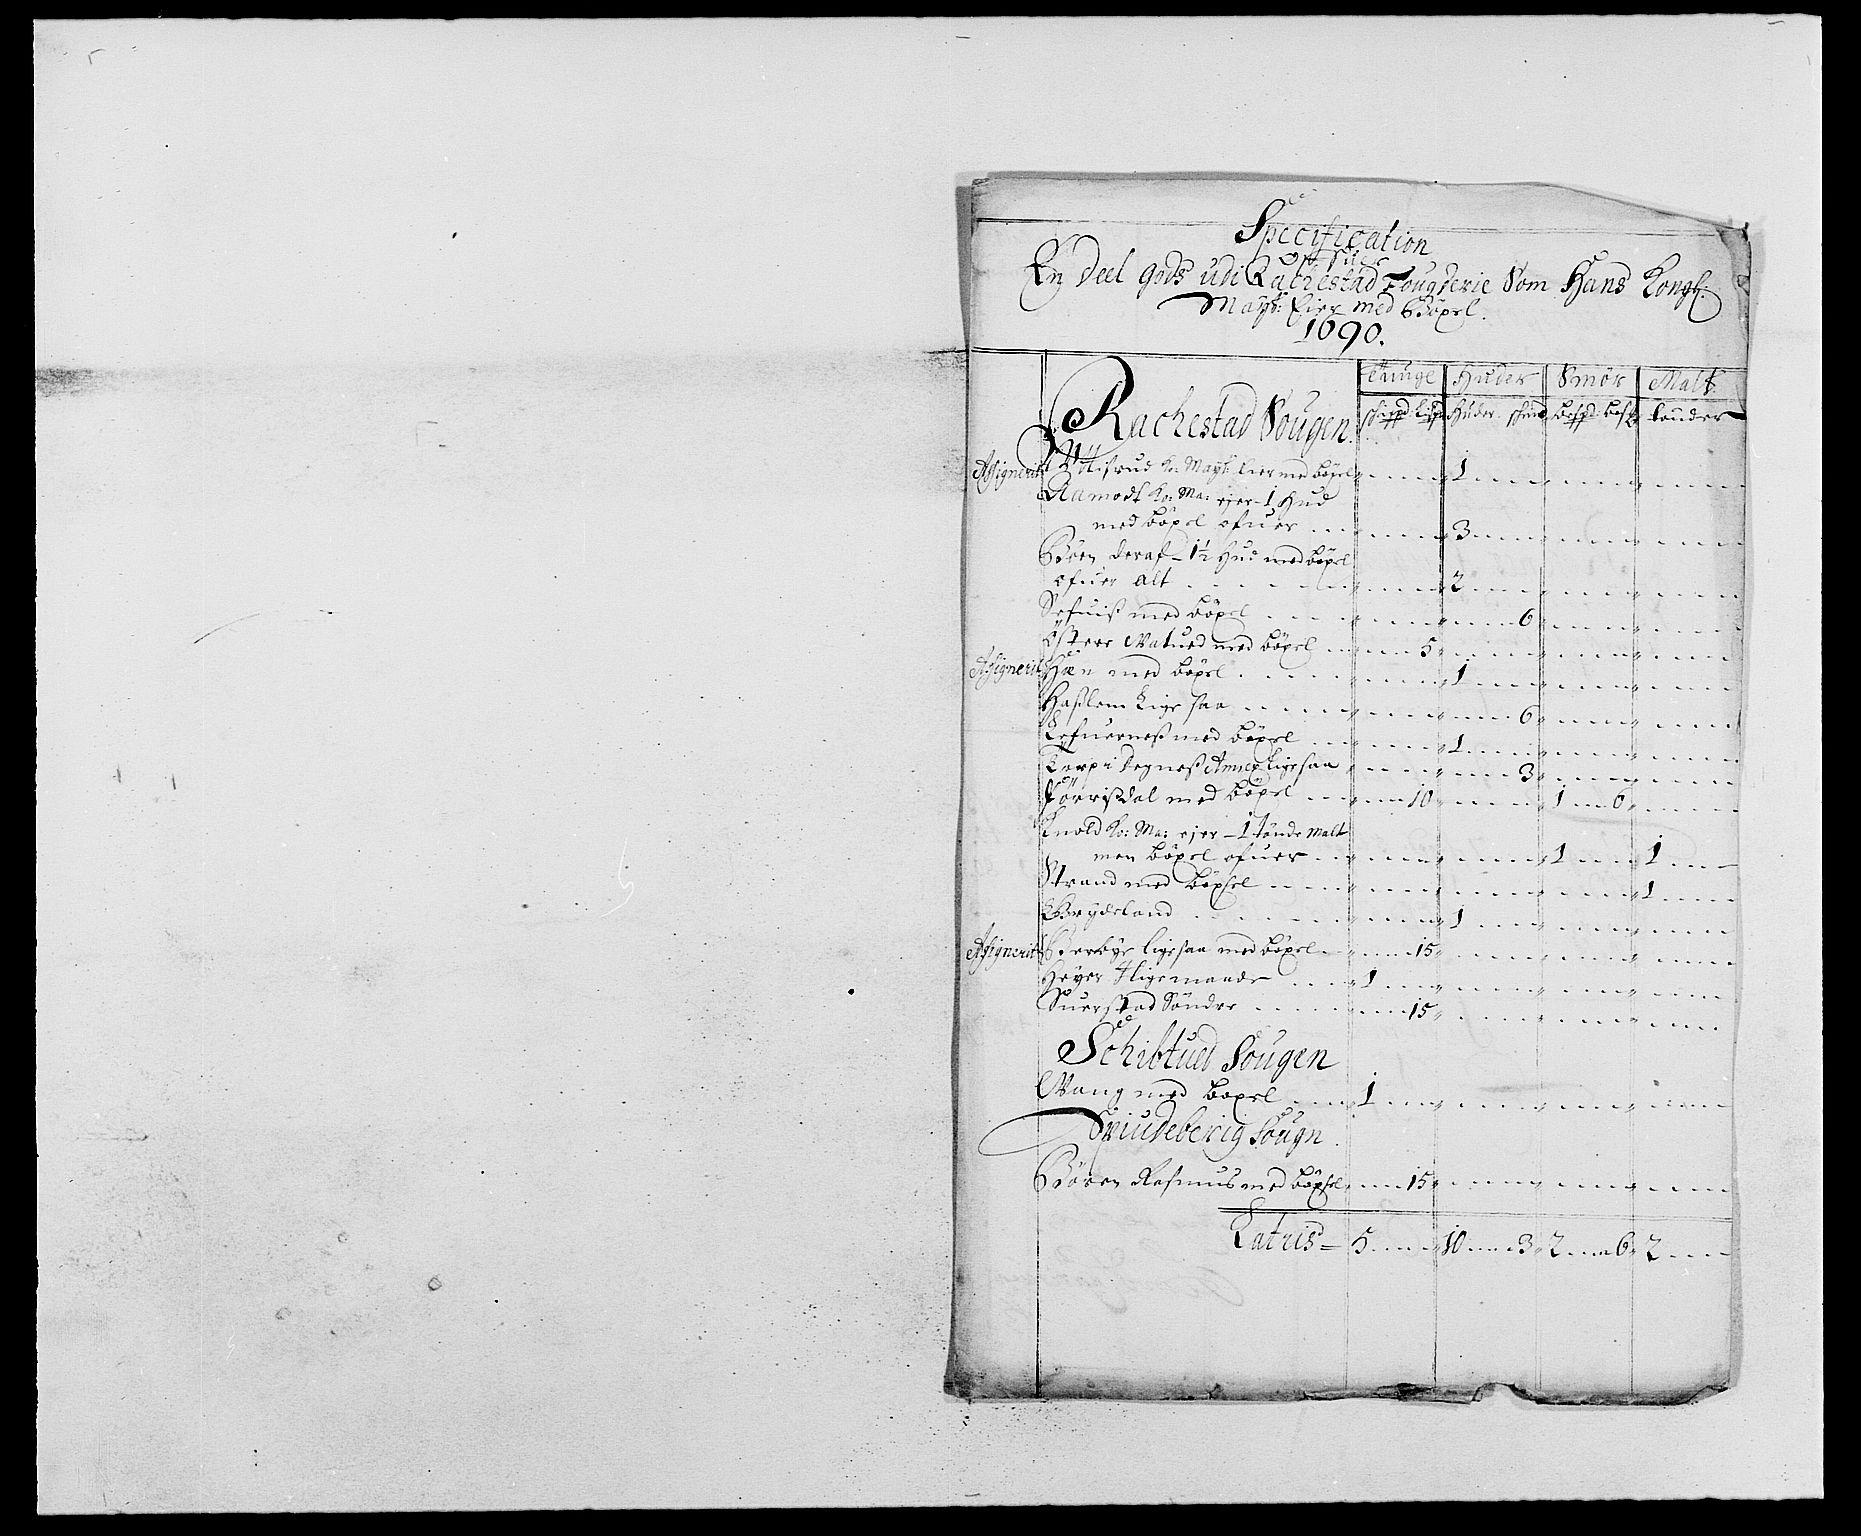 RA, Rentekammeret inntil 1814, Reviderte regnskaper, Fogderegnskap, R05/L0277: Fogderegnskap Rakkestad, 1689-1690, s. 187